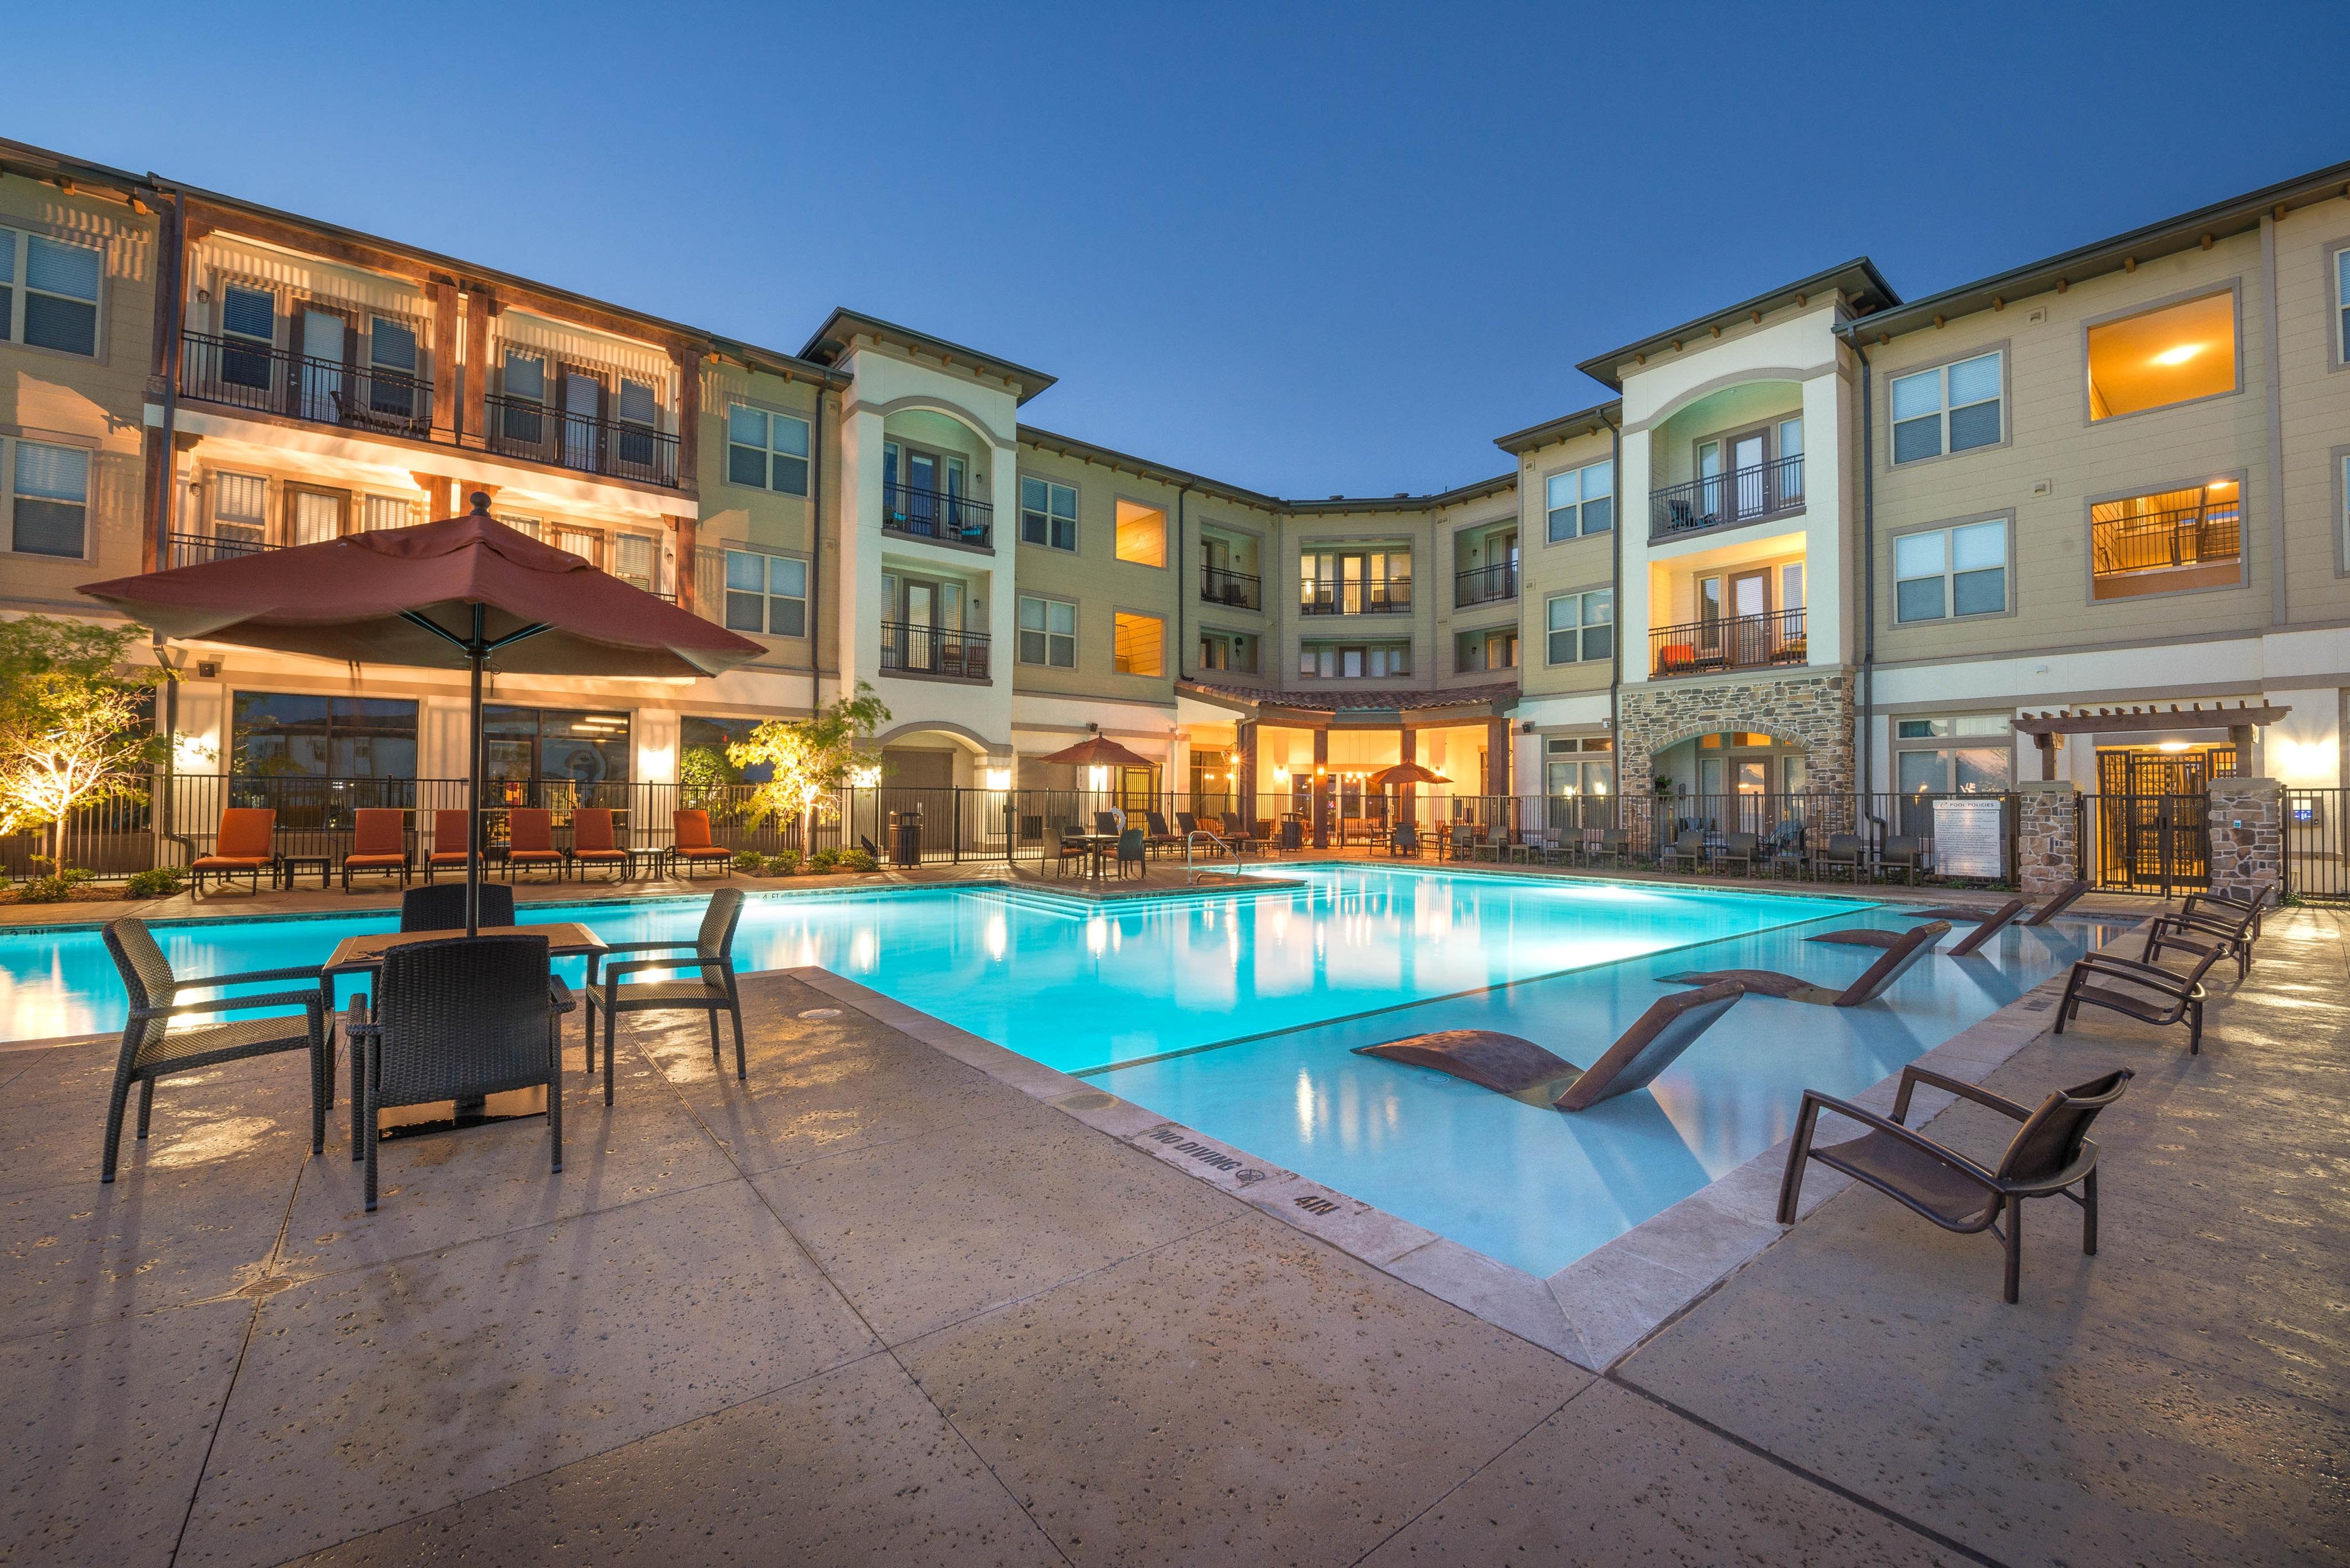 pool-elan-dallas-murphys-corporate-lodging